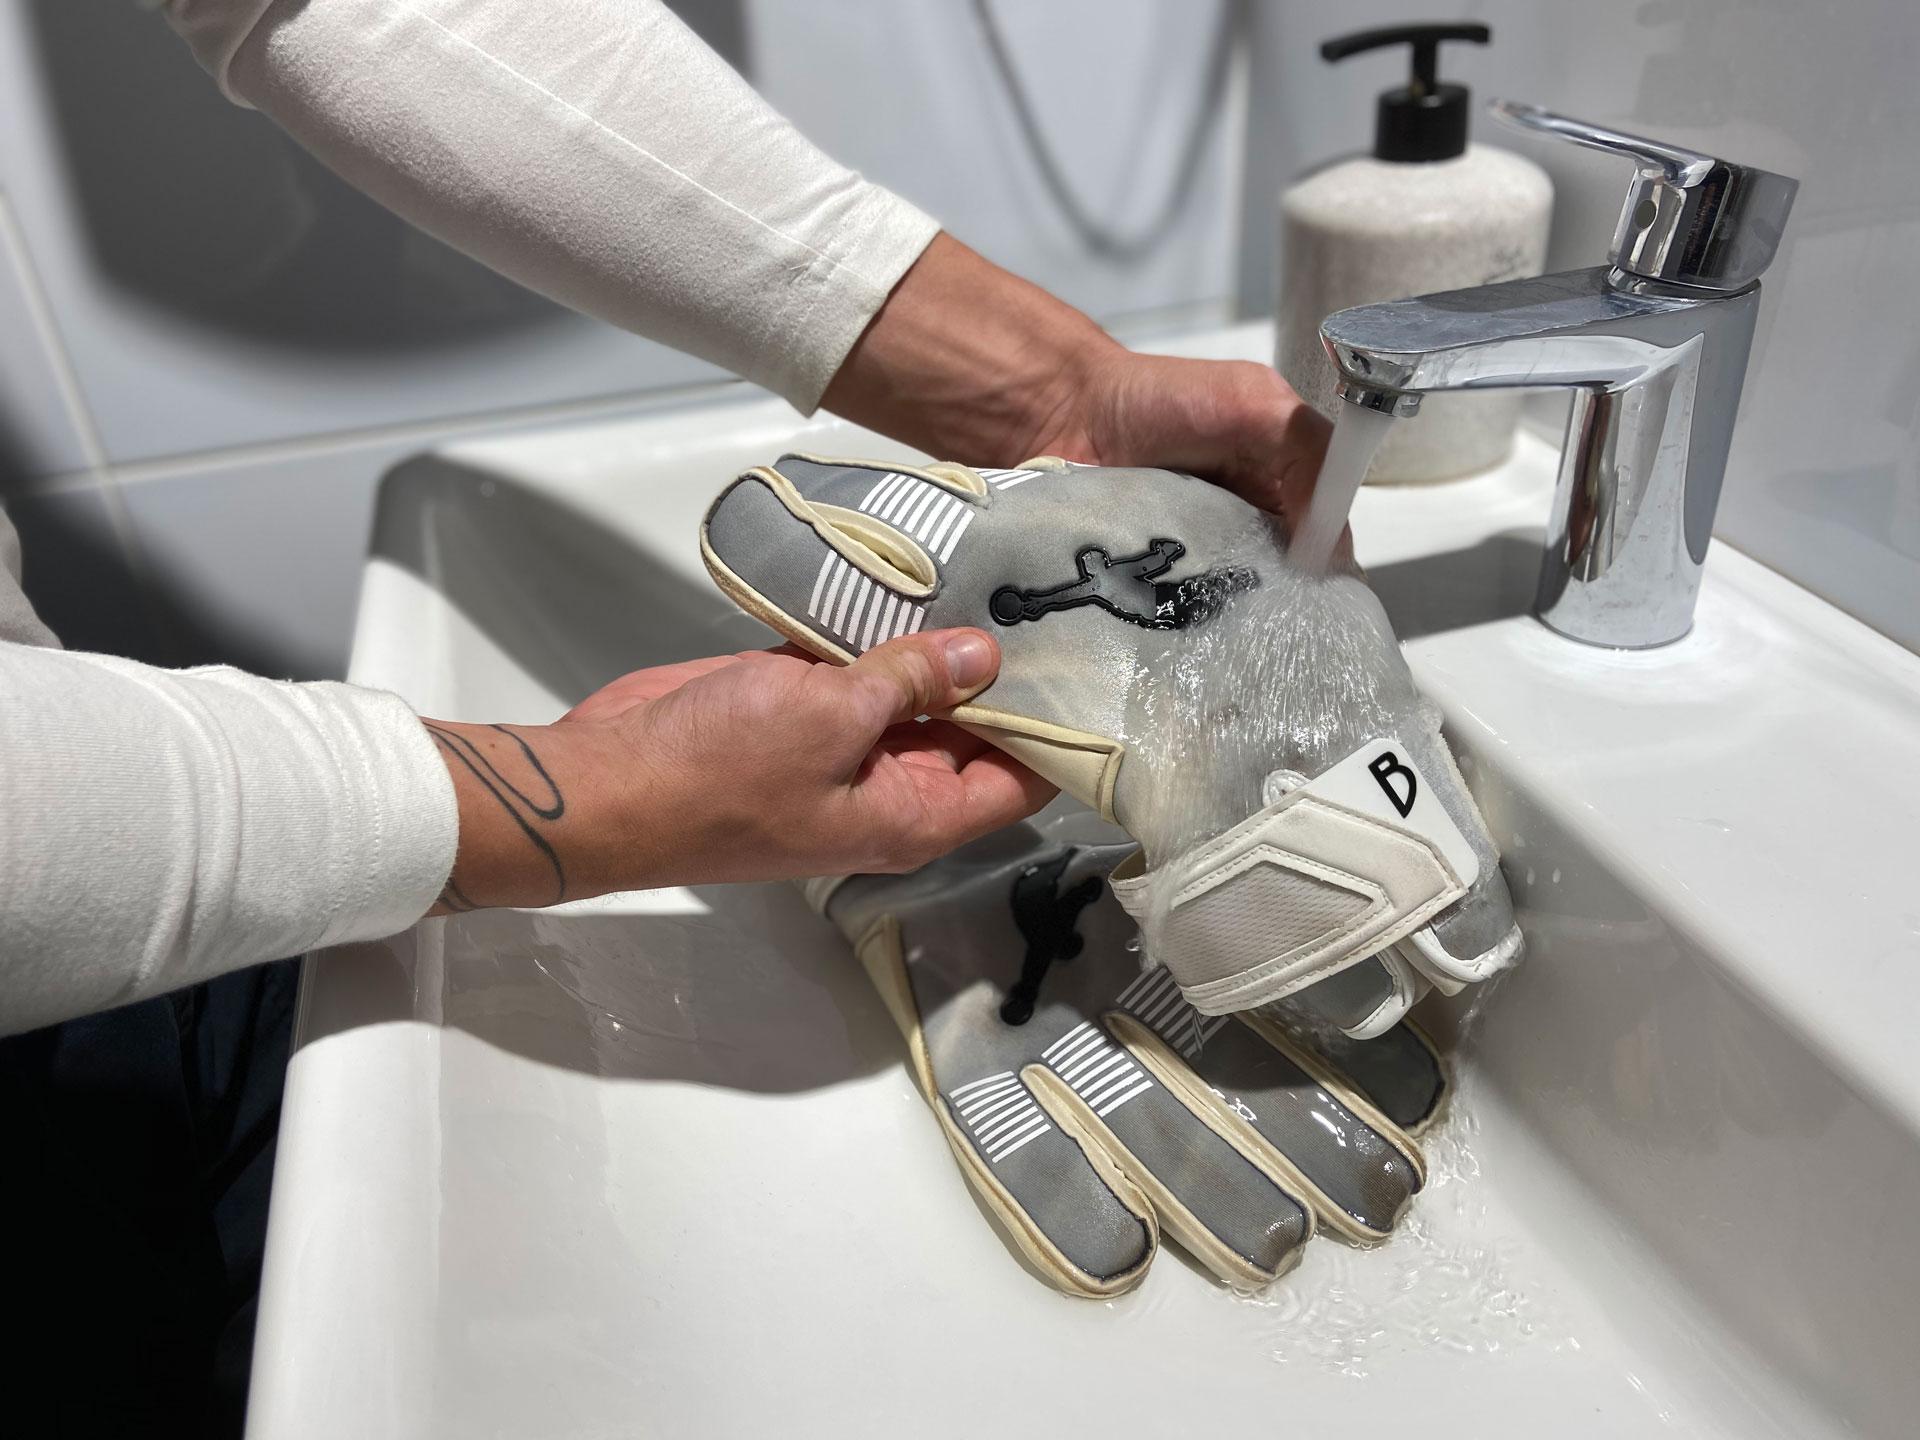 Brave GK Catalyst Grey средства для защиты перчаток интернет-магазин Brave GK